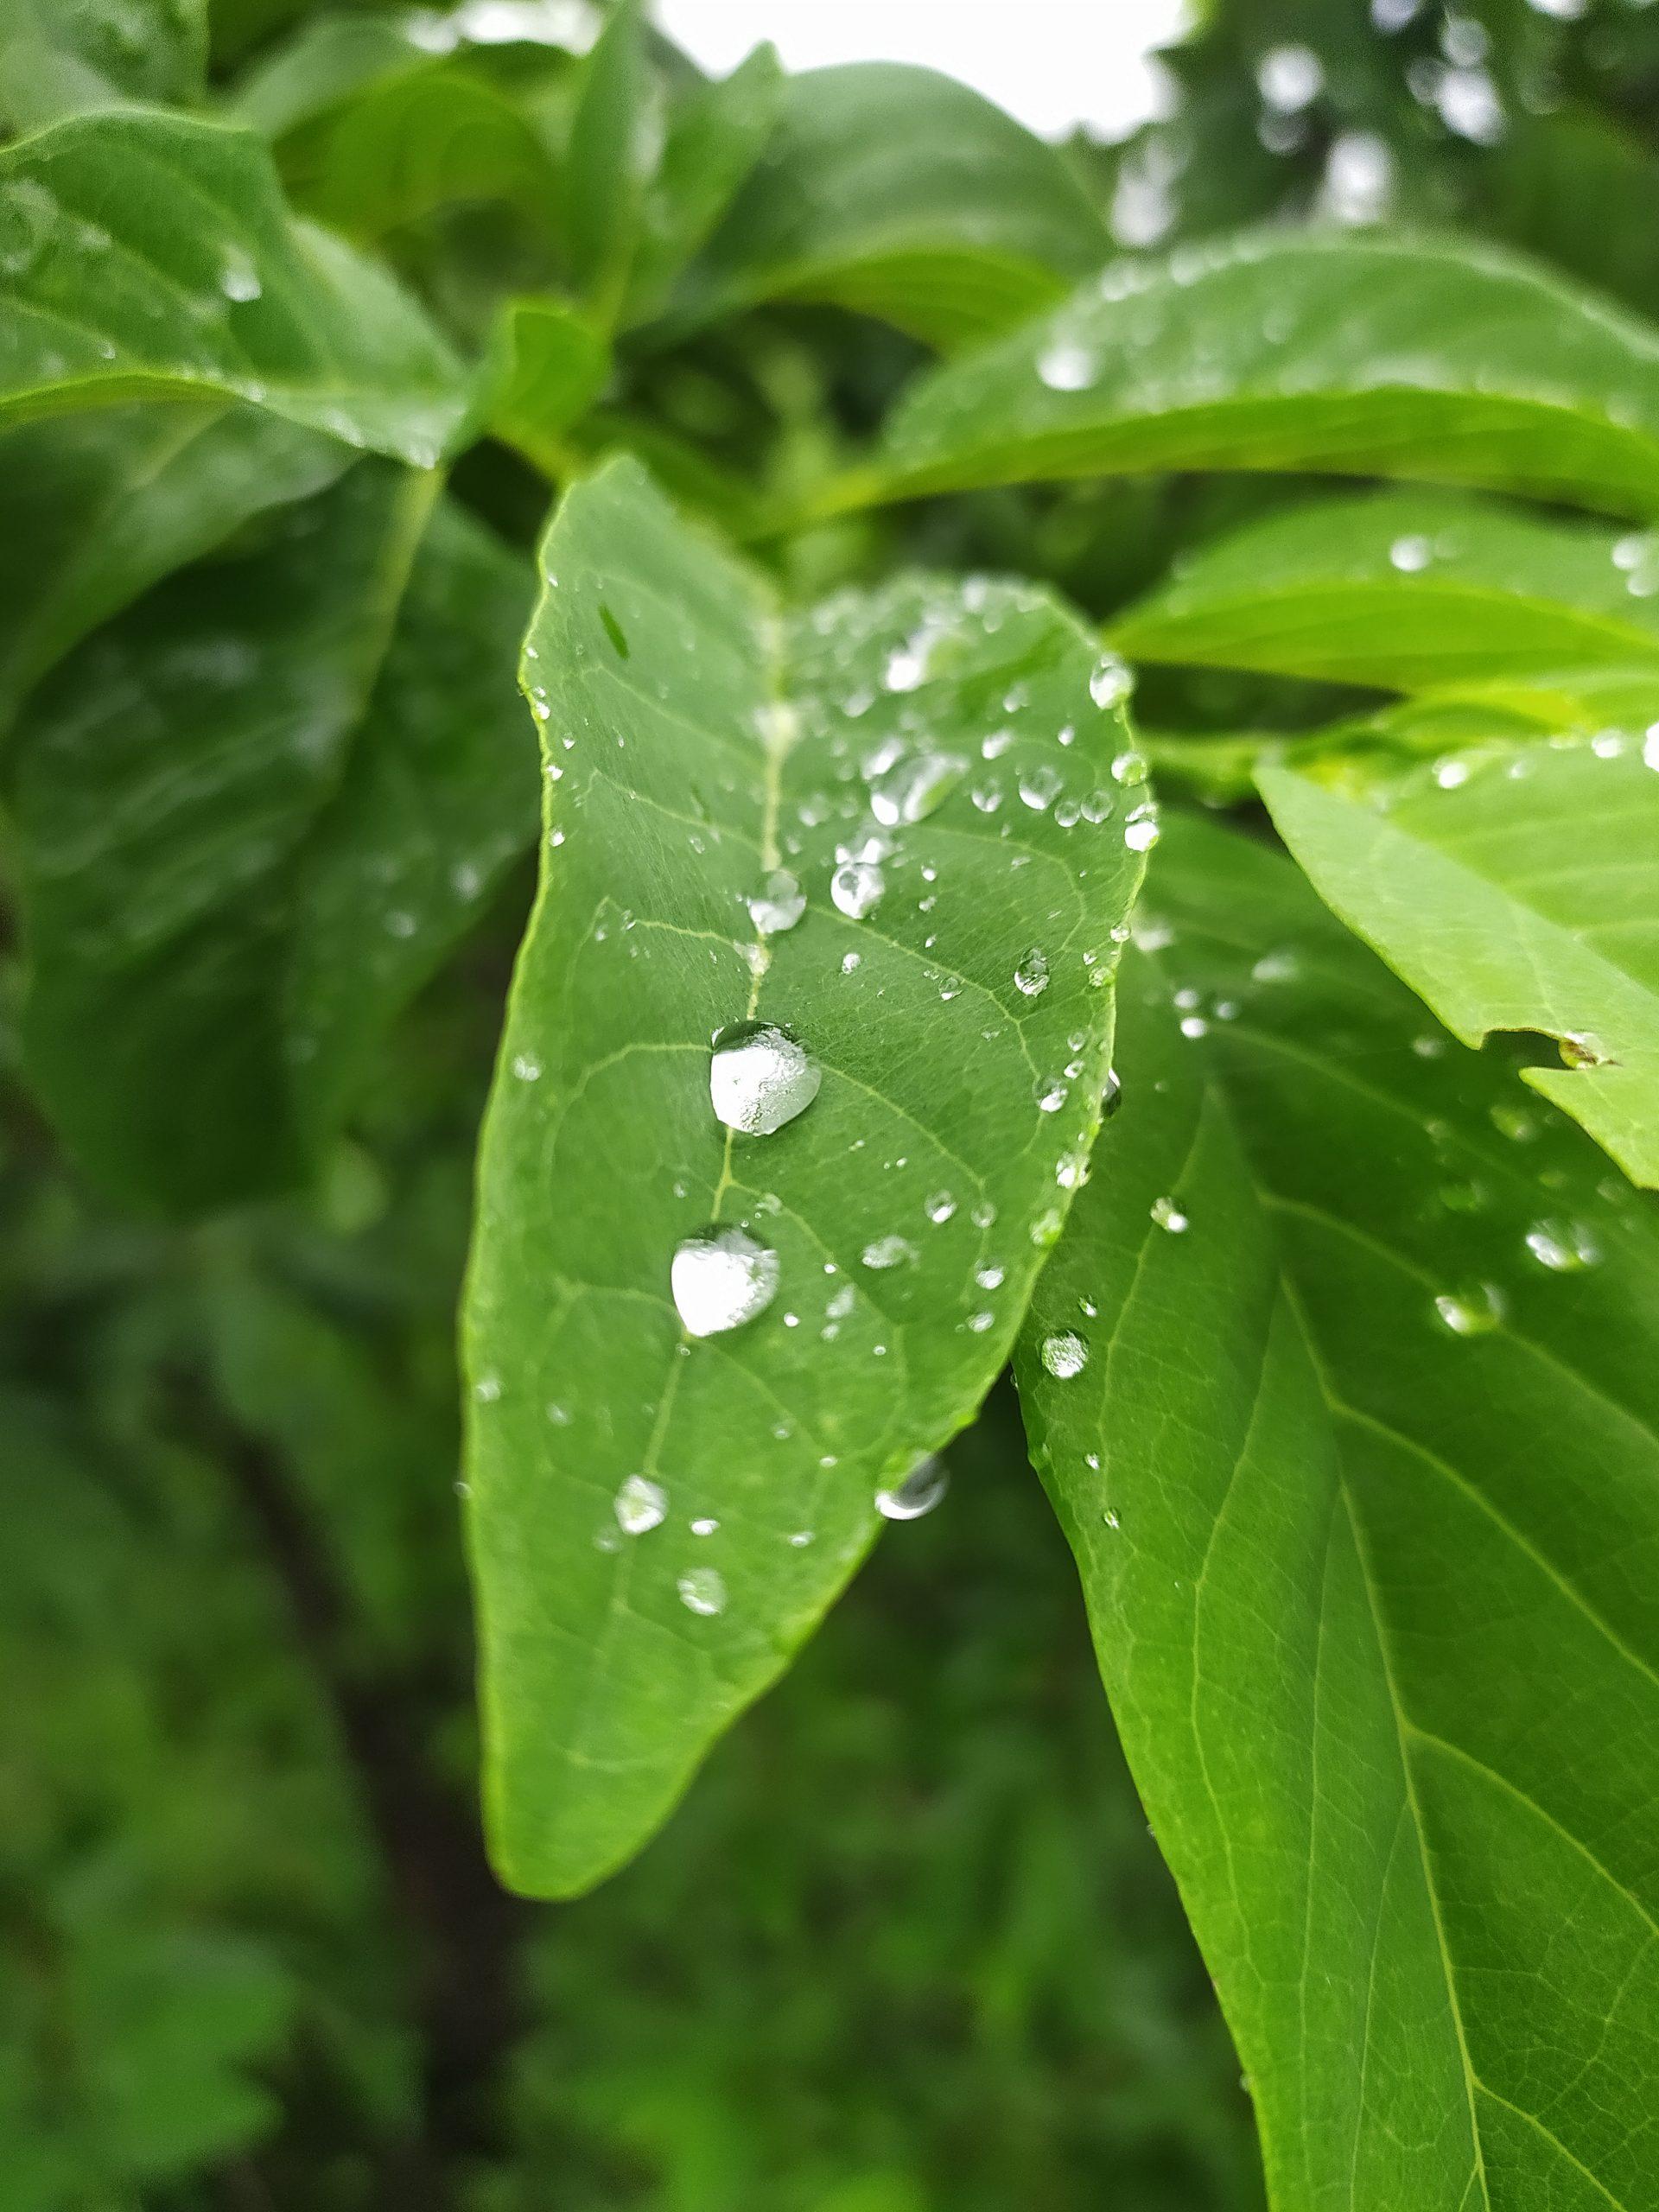 Rain drops on a plant leaves